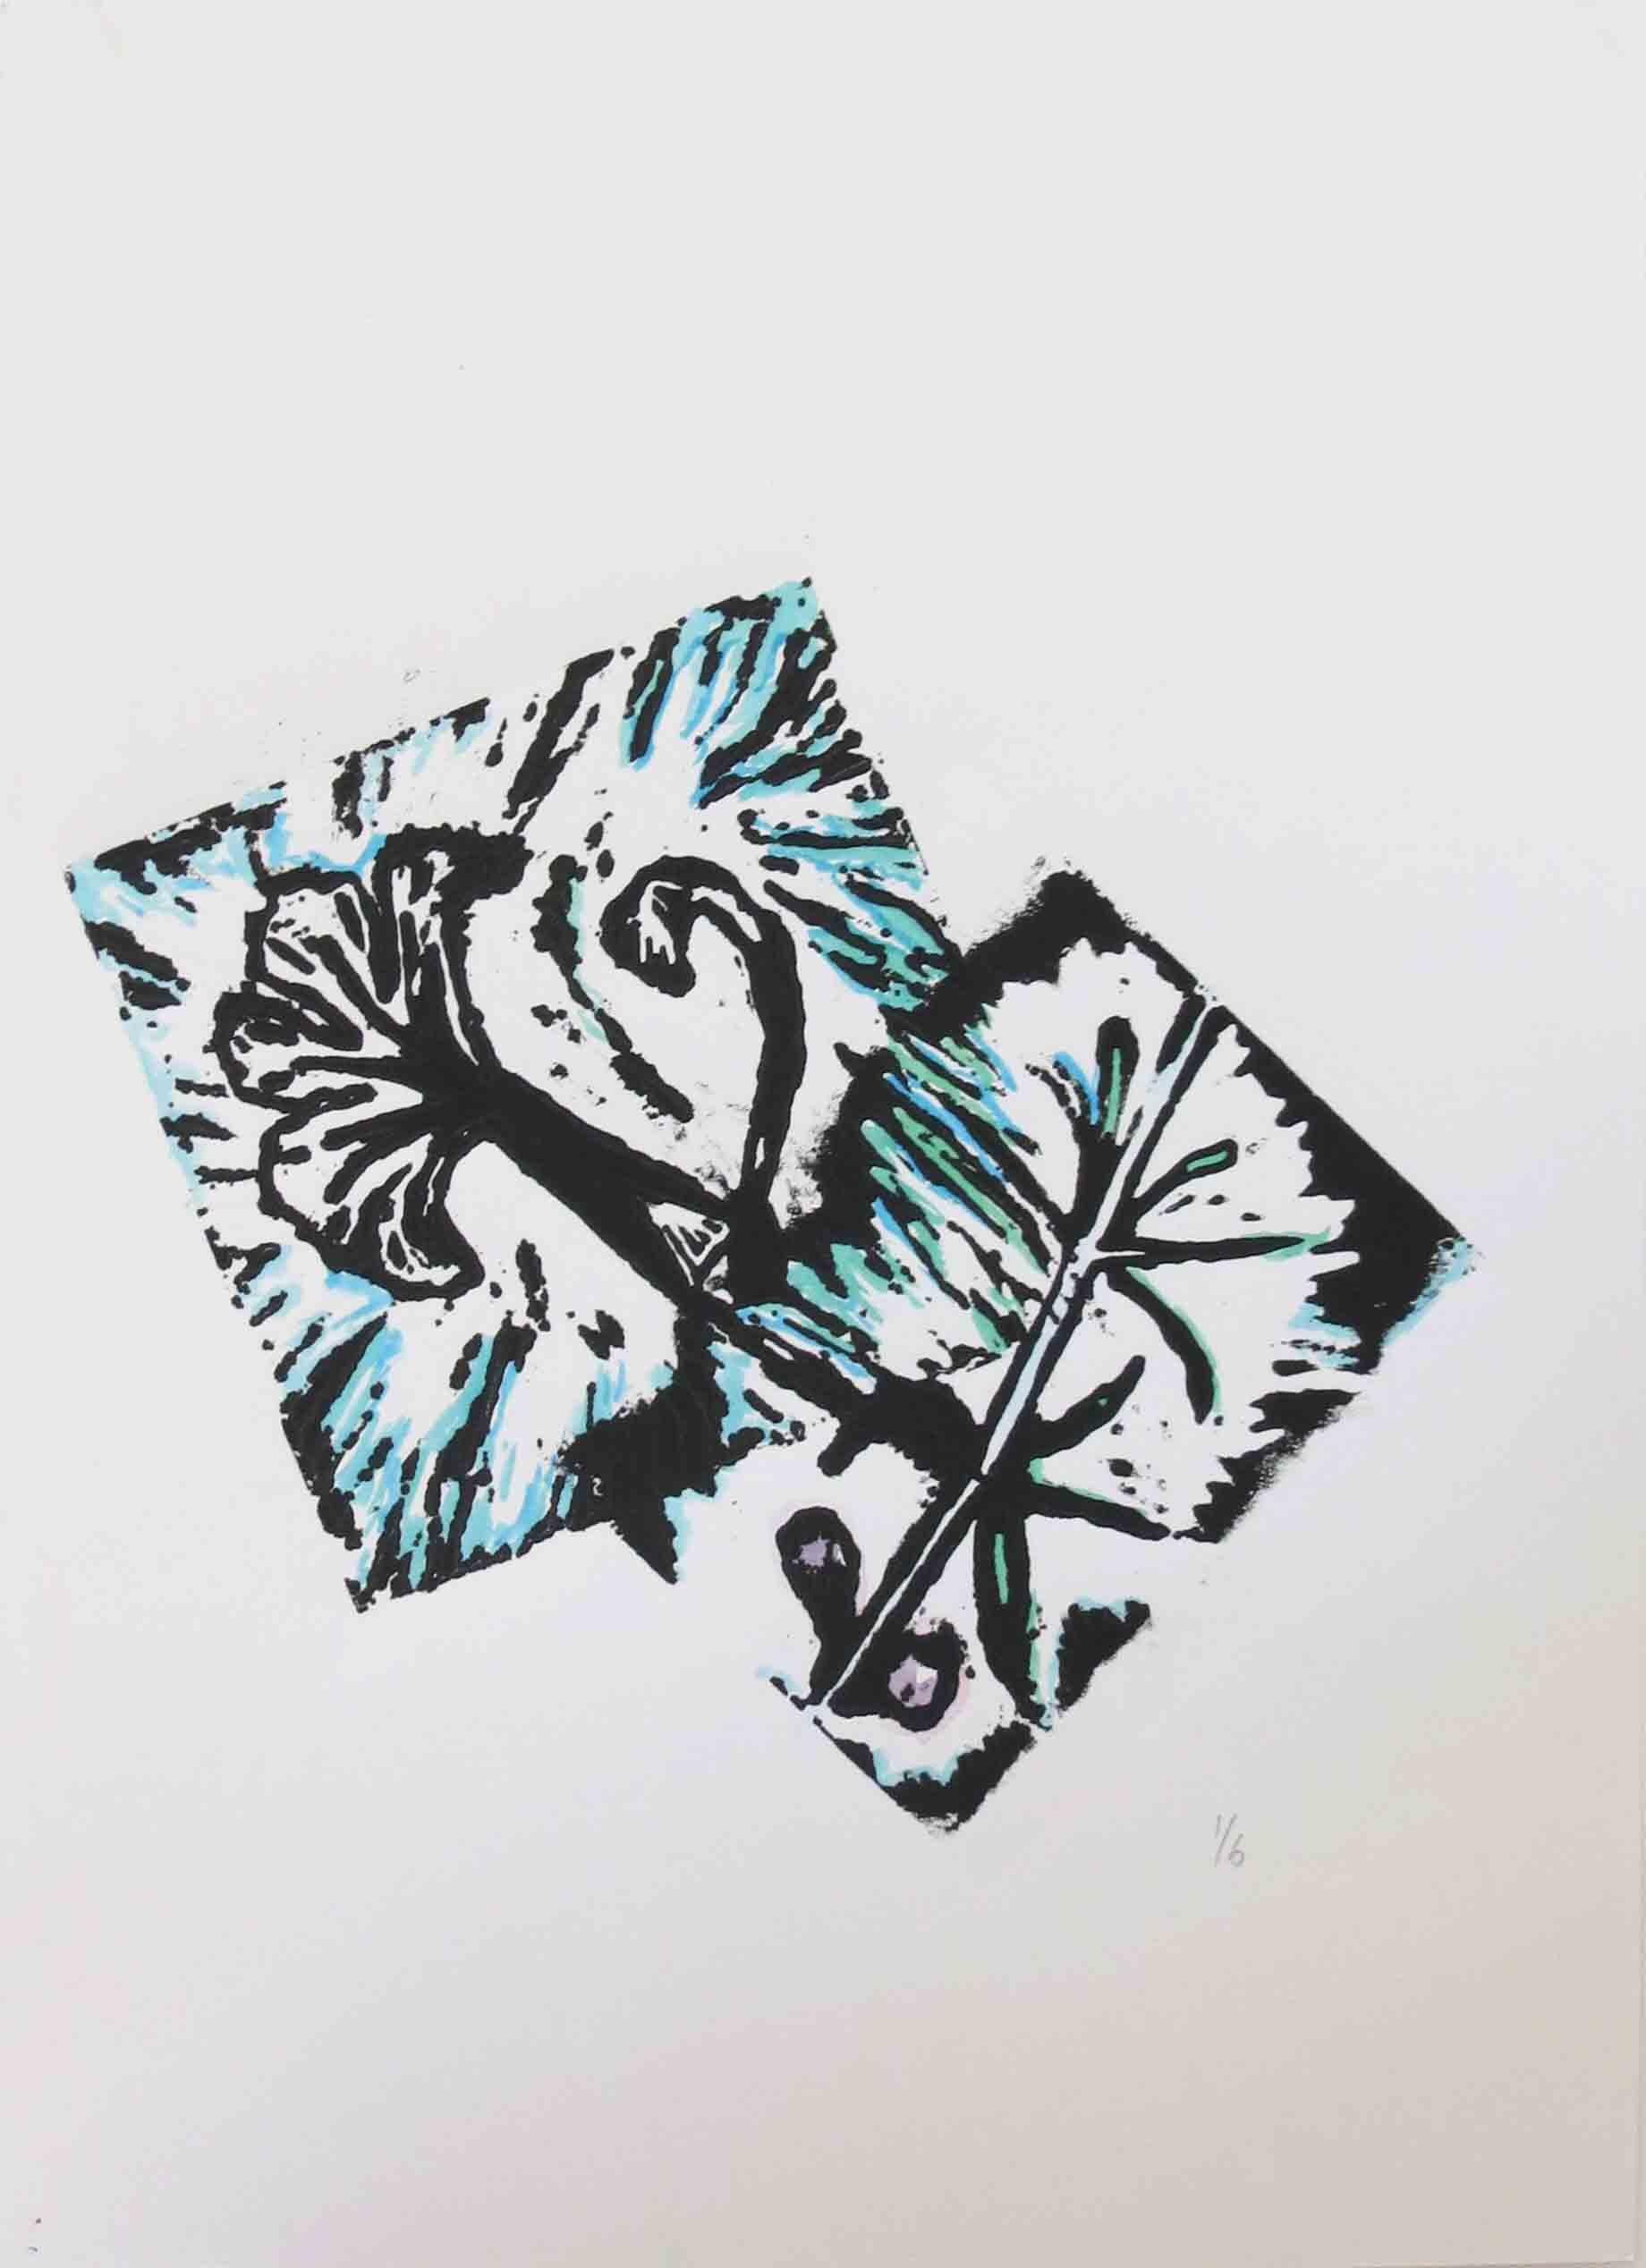 70. Kado Muir, Malkakutjal, 2019, linocut on paper, 42 x 30.5 cm $325